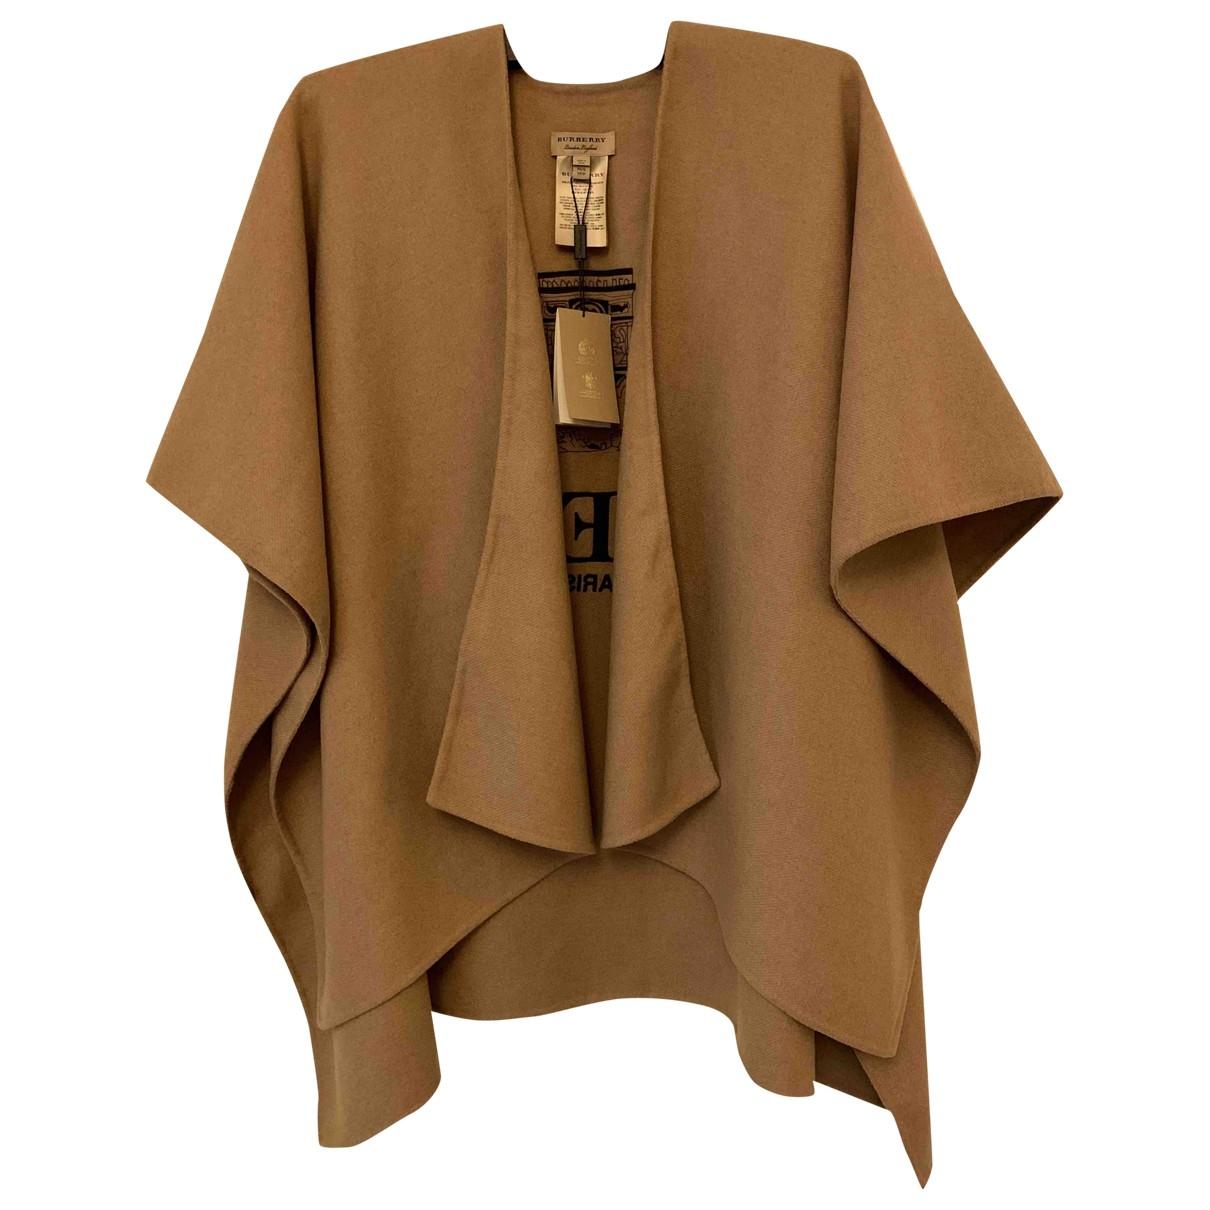 Burberry \N Camel Cashmere jacket for Women S International